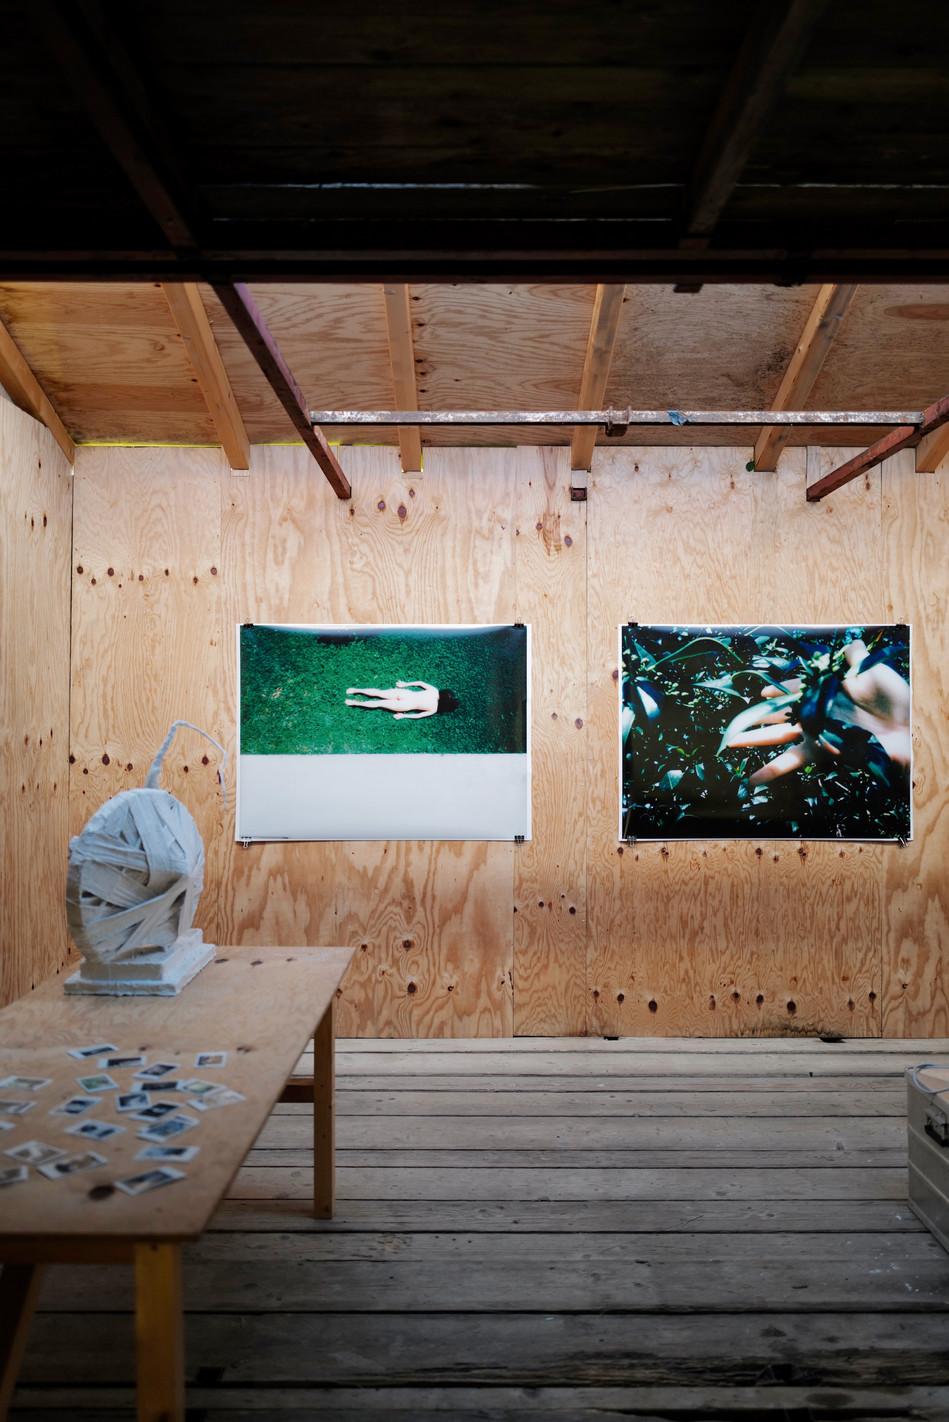 Urban Search, Decadent Rescue, Blow ups of a series of Polaroids, 85 x 120 cm, 2020. Sculpture: Moon Car, ca. 30 x 40 x 60 cm, 2020.